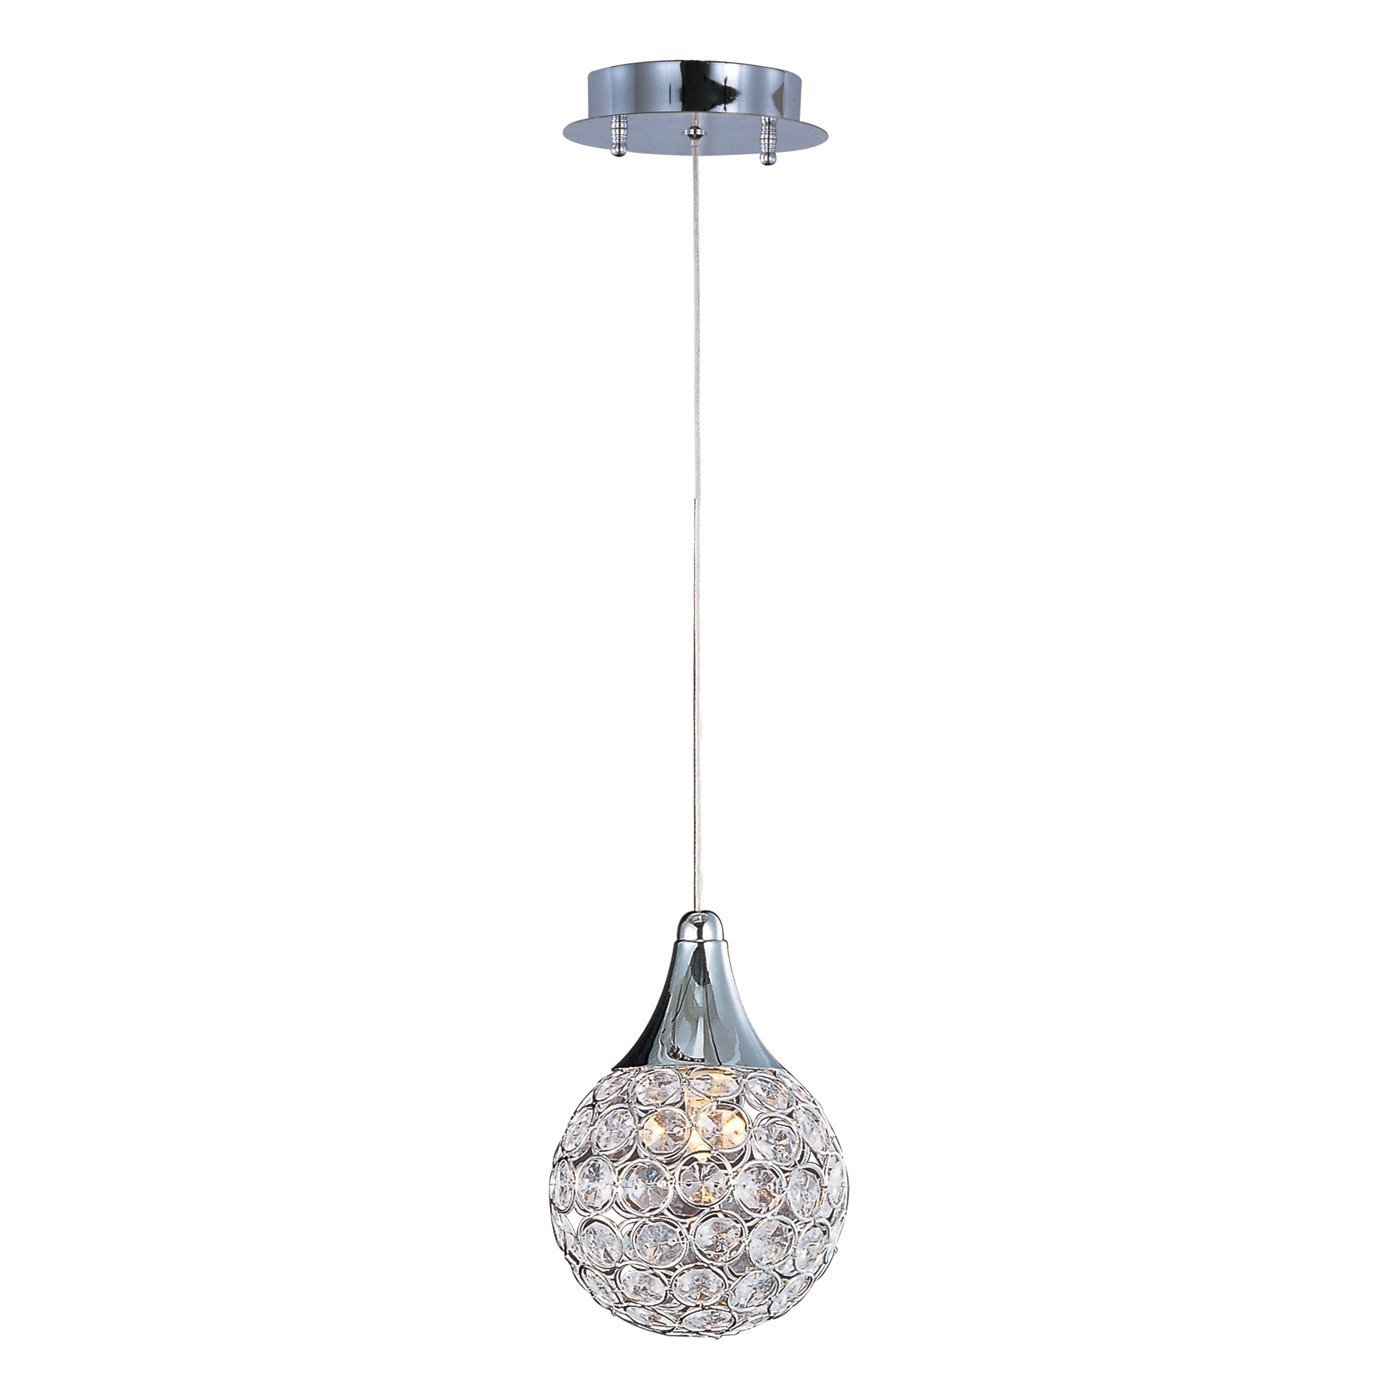 online get cheap modern mini chandelier aliexpresscom  alibaba  - modern led crystal pendant lamp round restaurant crystal chandelier lusterlamp e light vv brilliant mini illumination